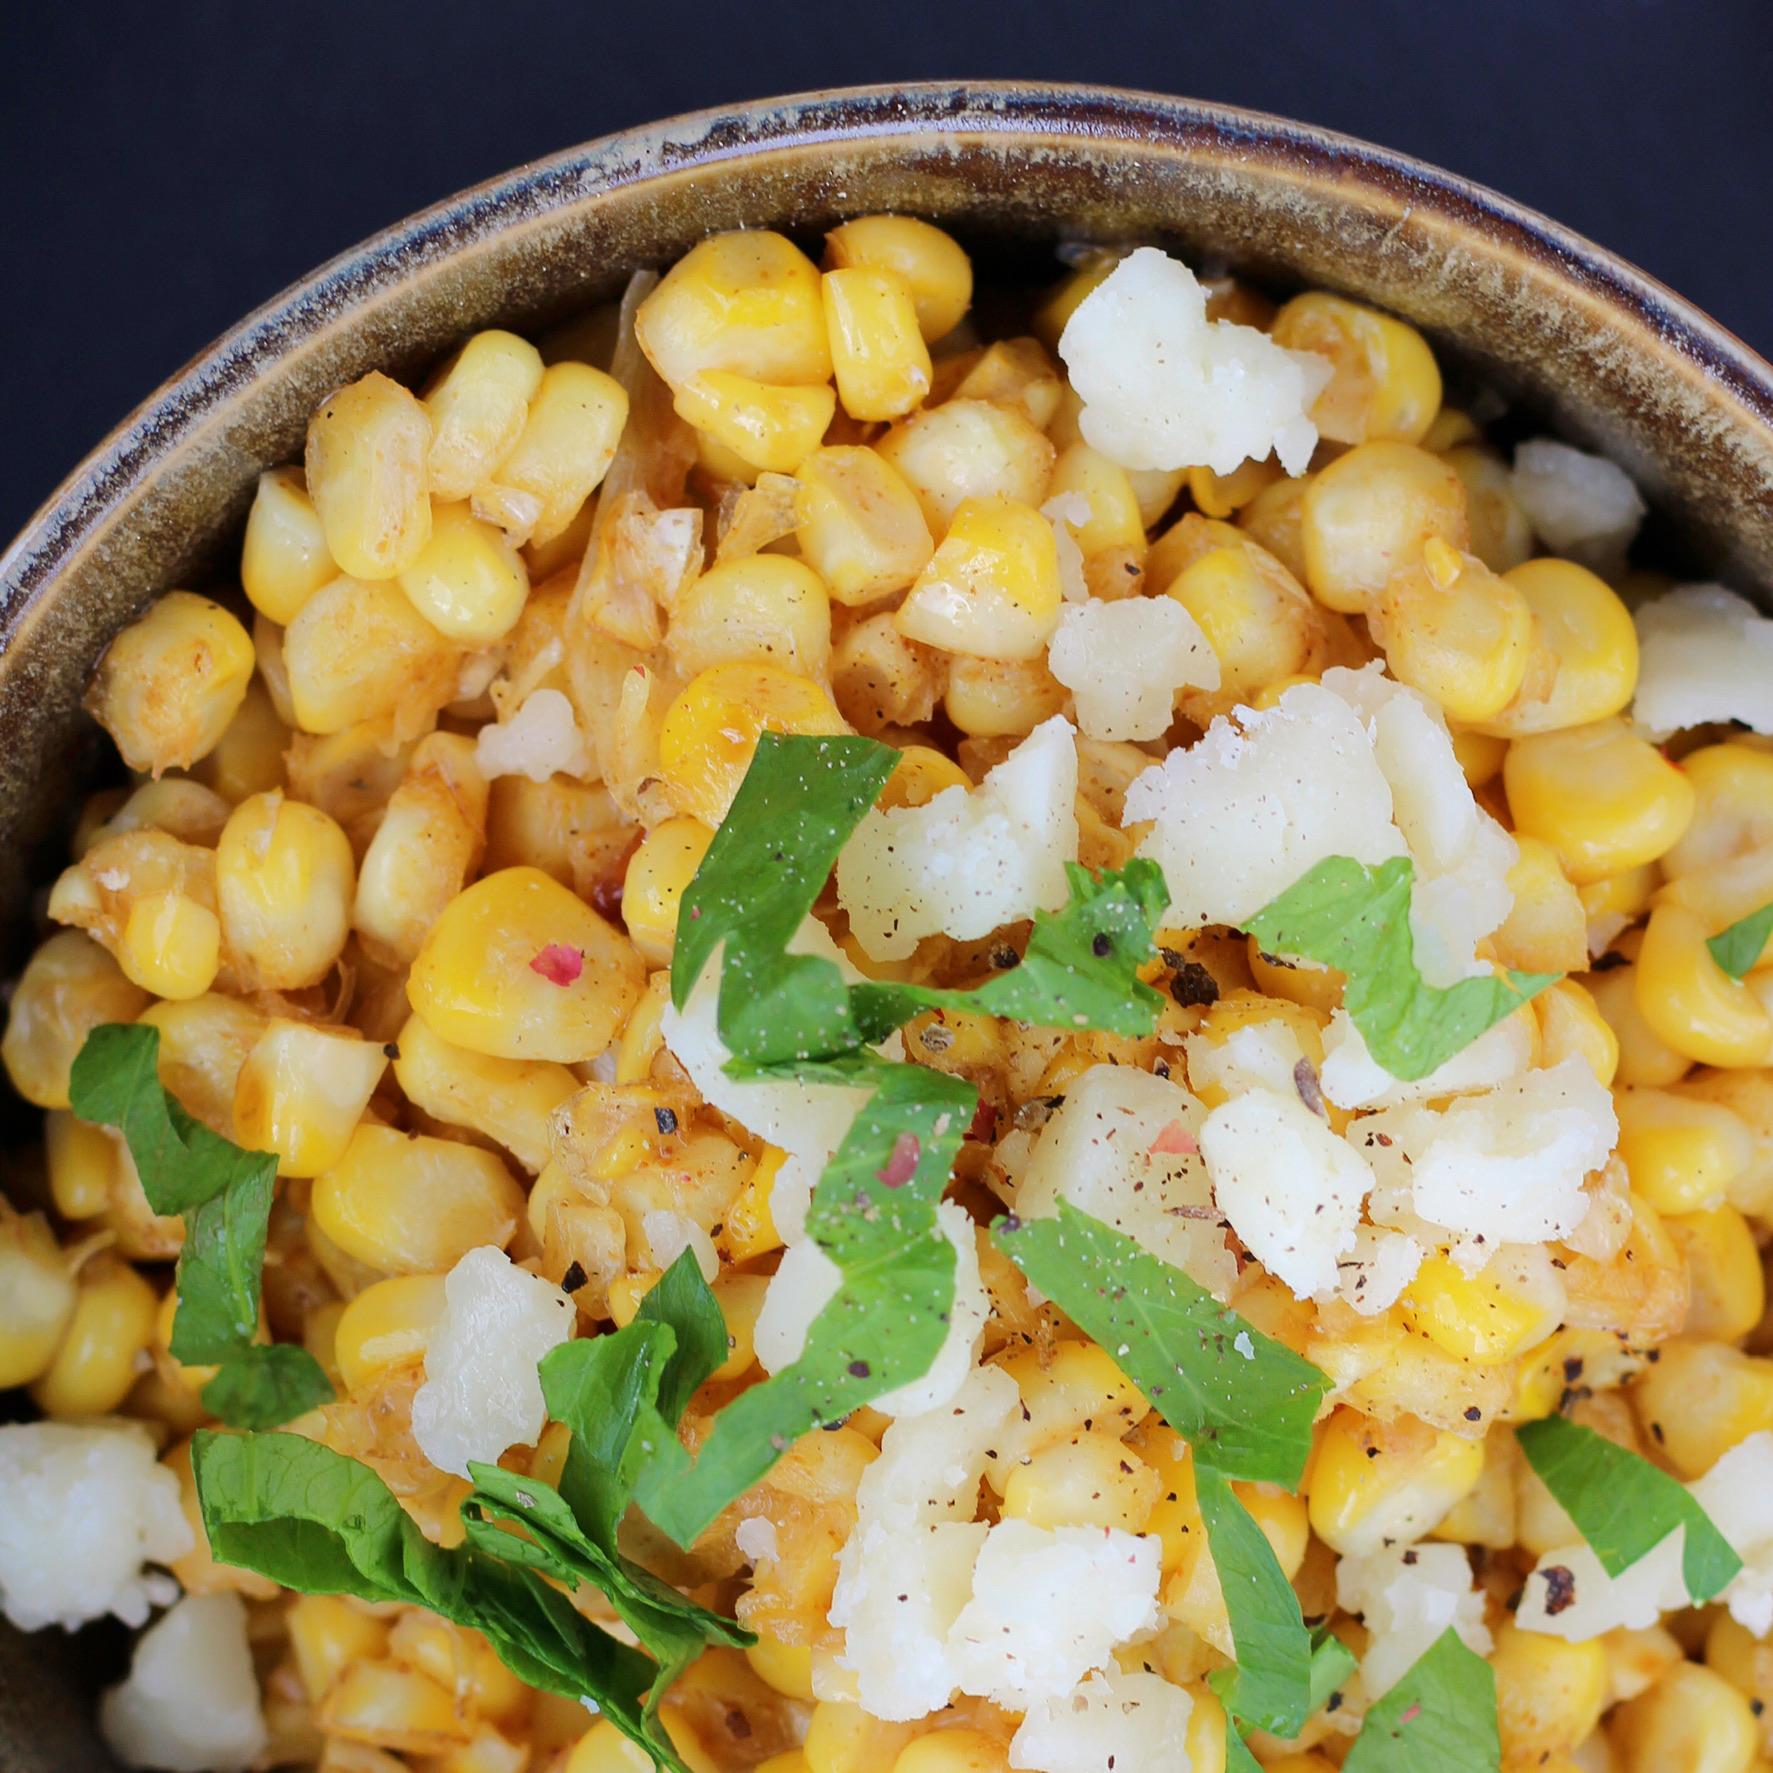 Lighter Skillet Mexican Street Corn